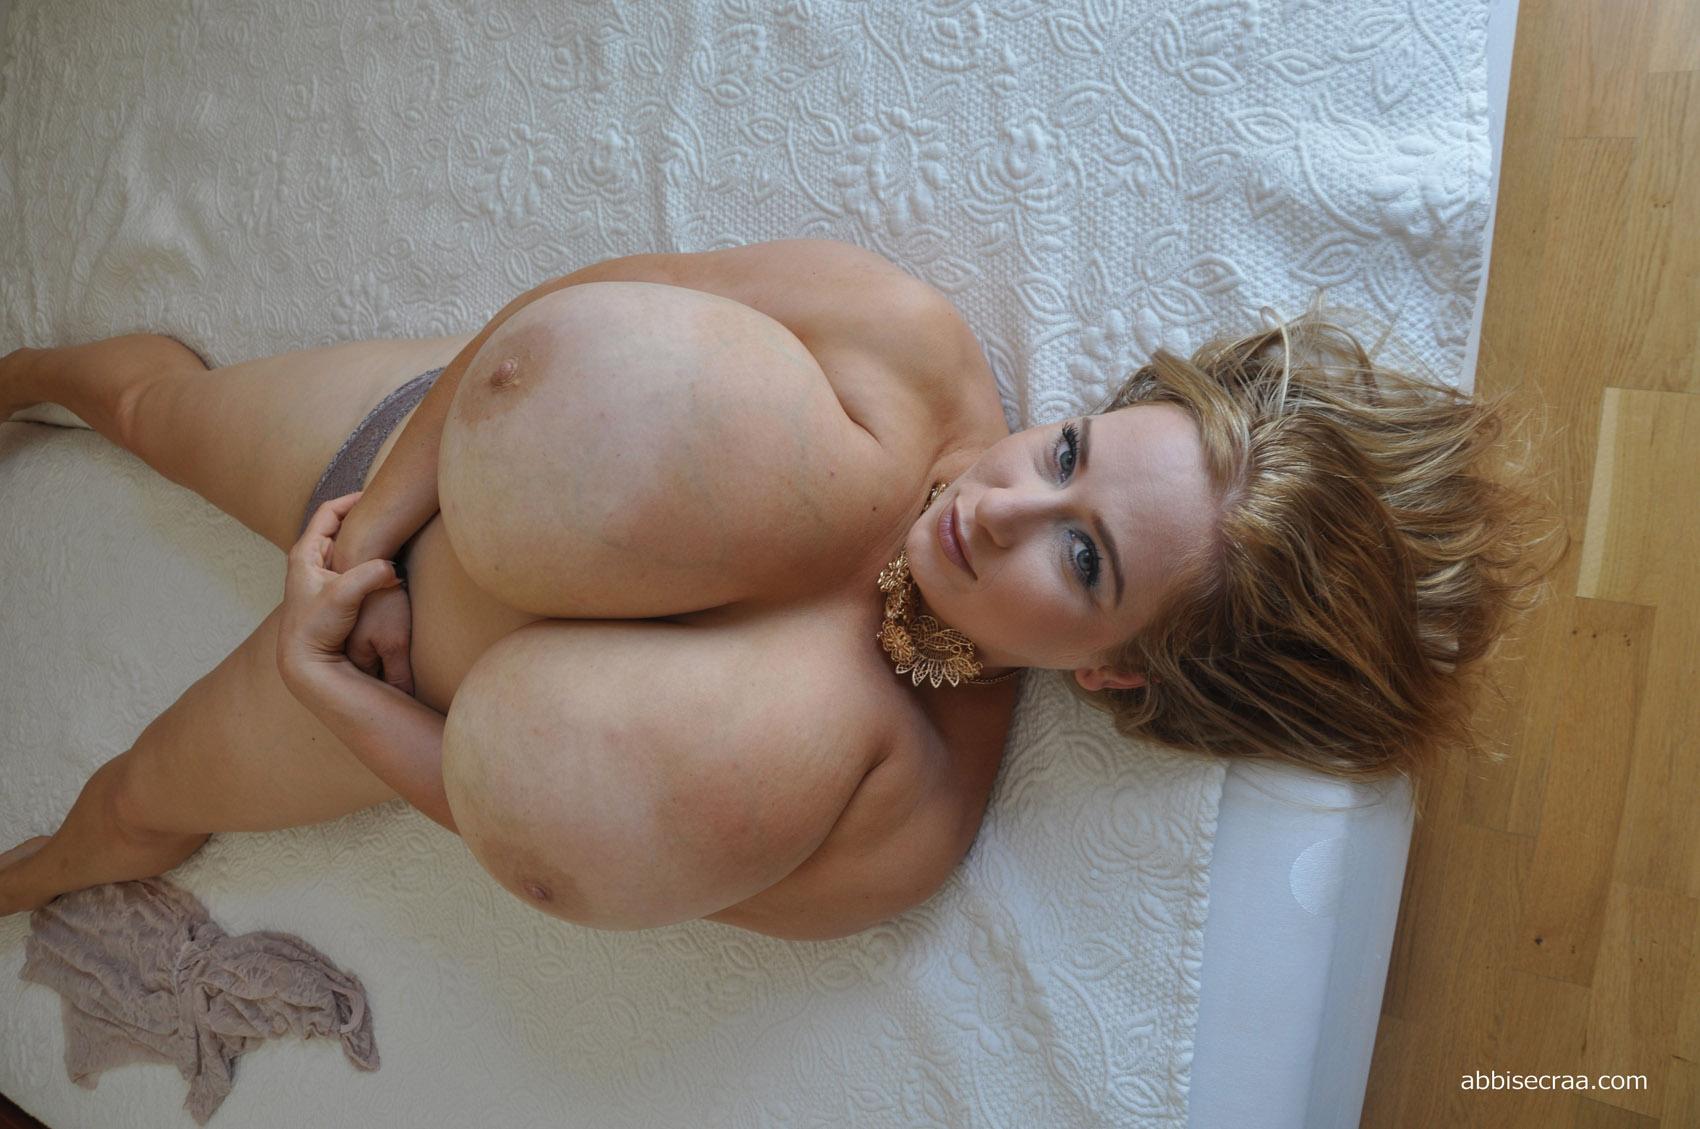 Abbie Secraa